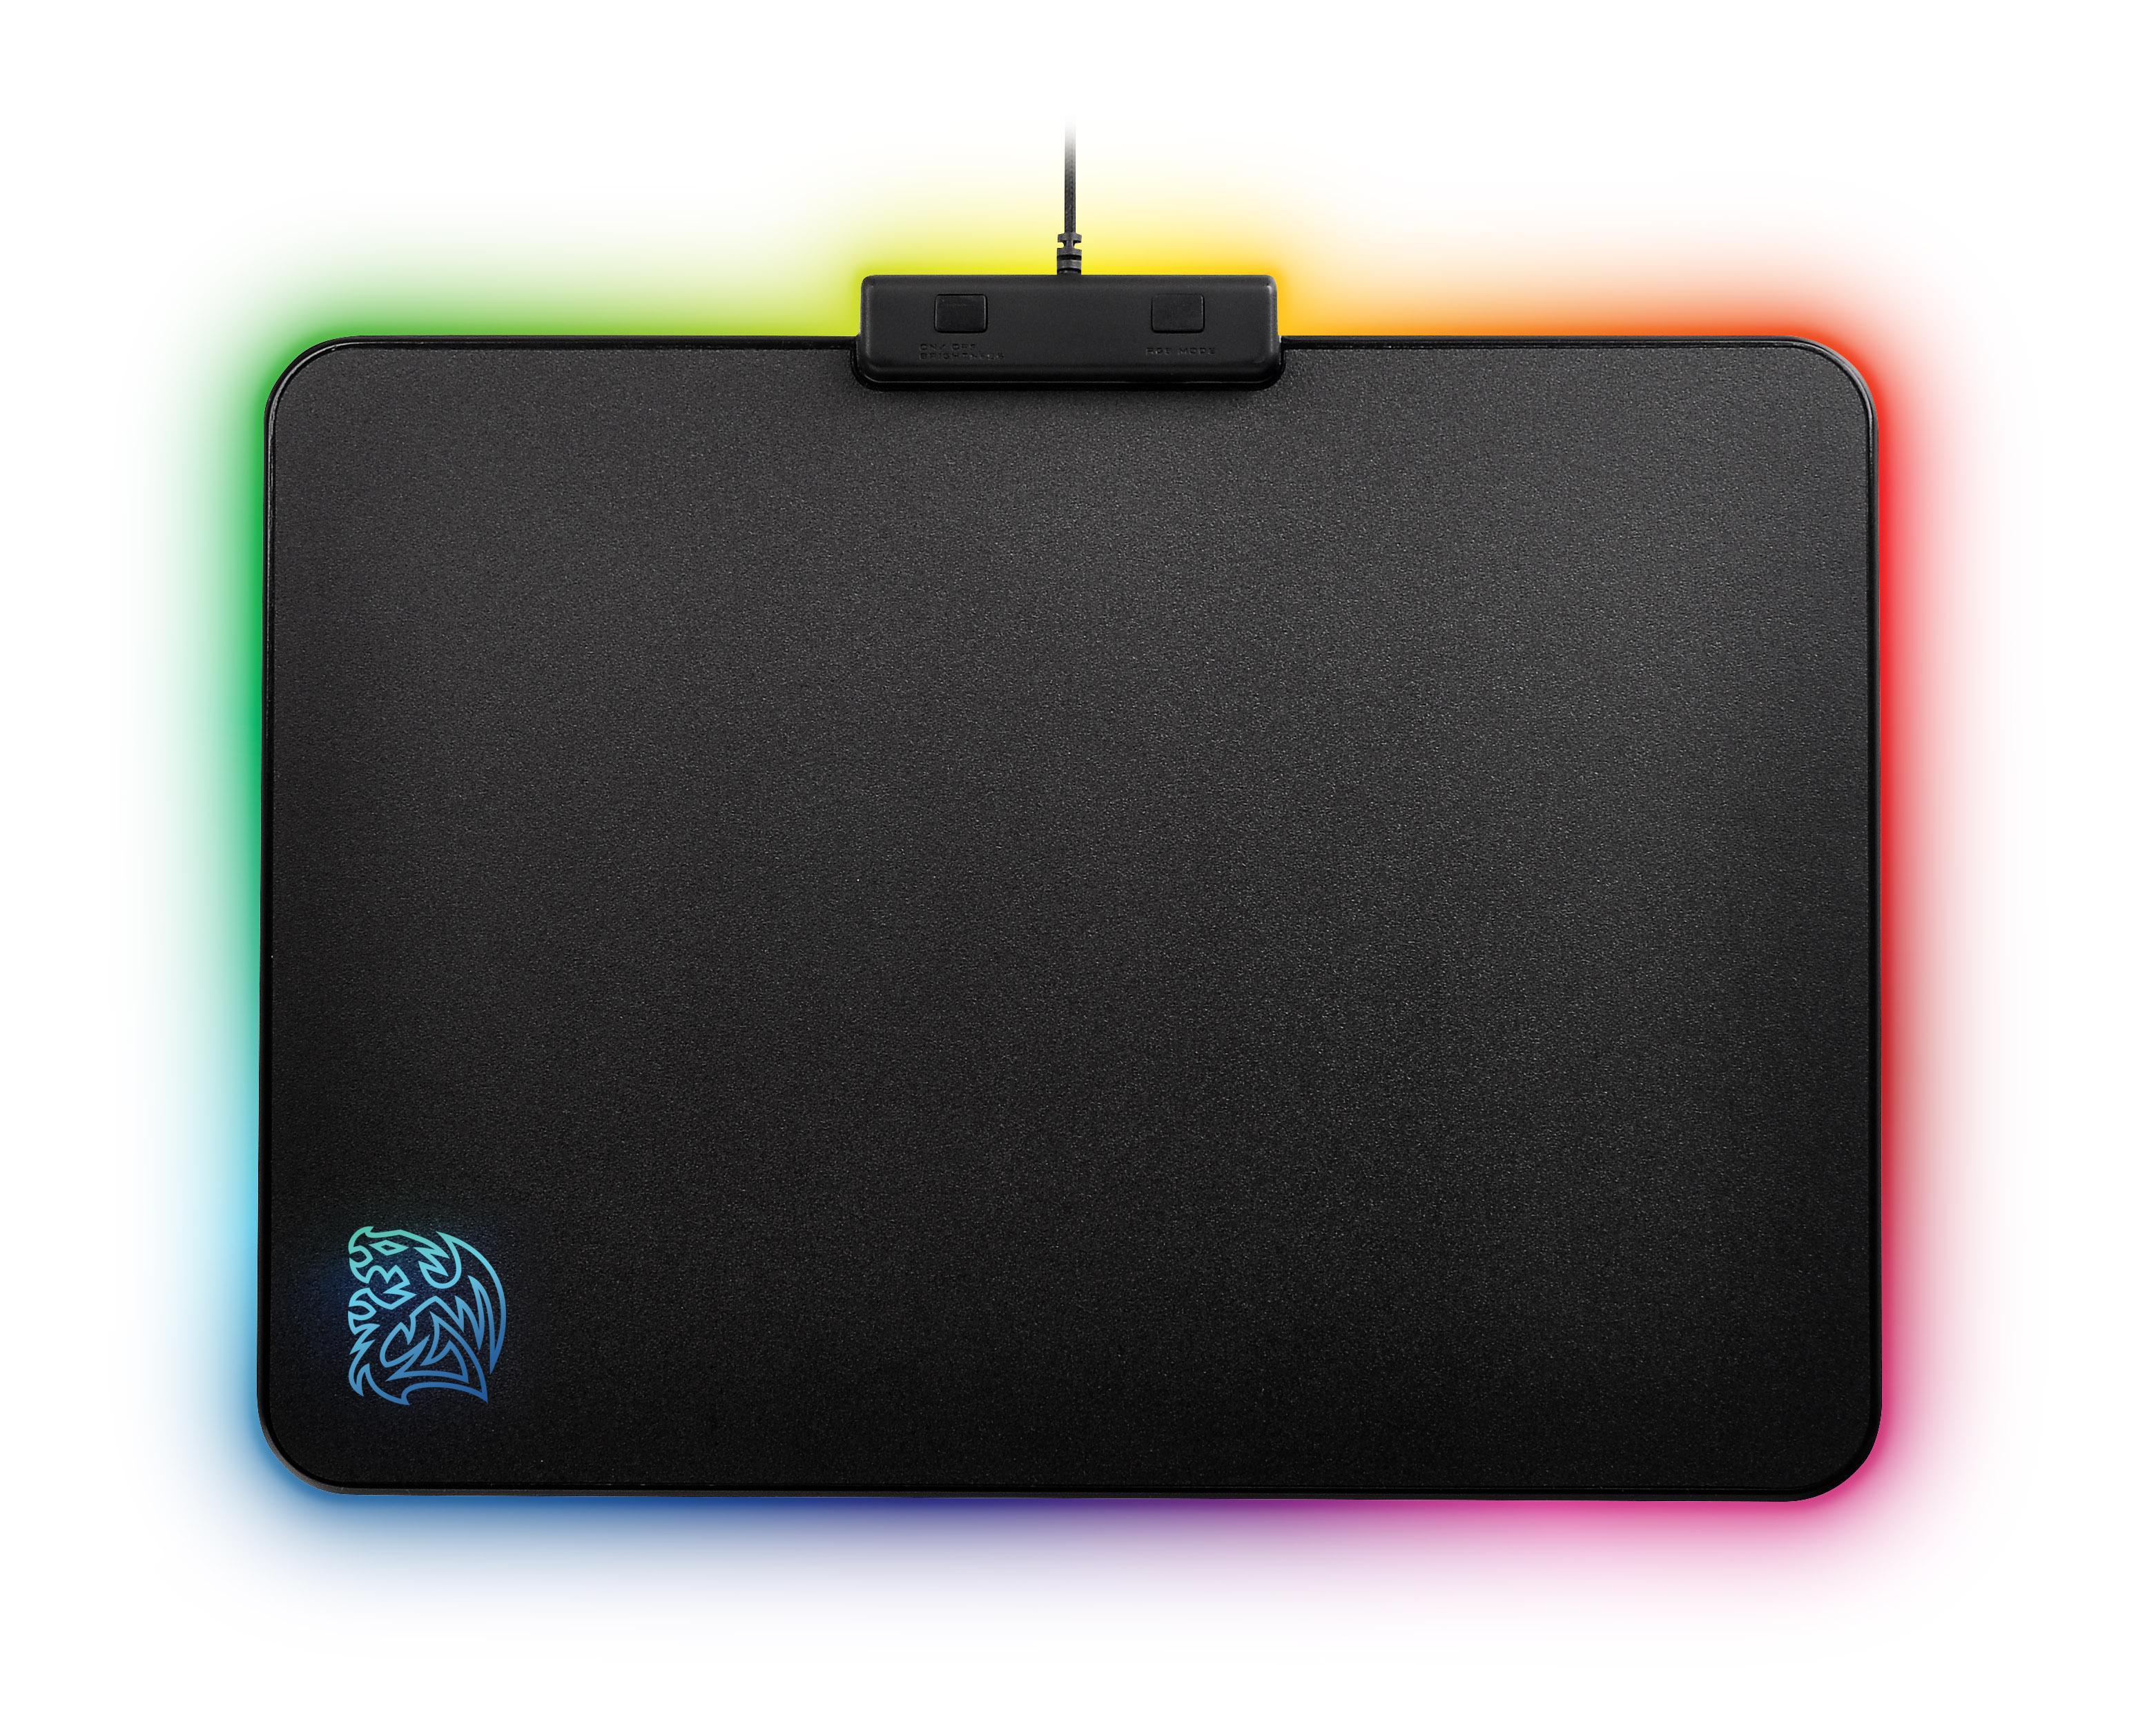 Draconem RGB - Touch Mouse Pad